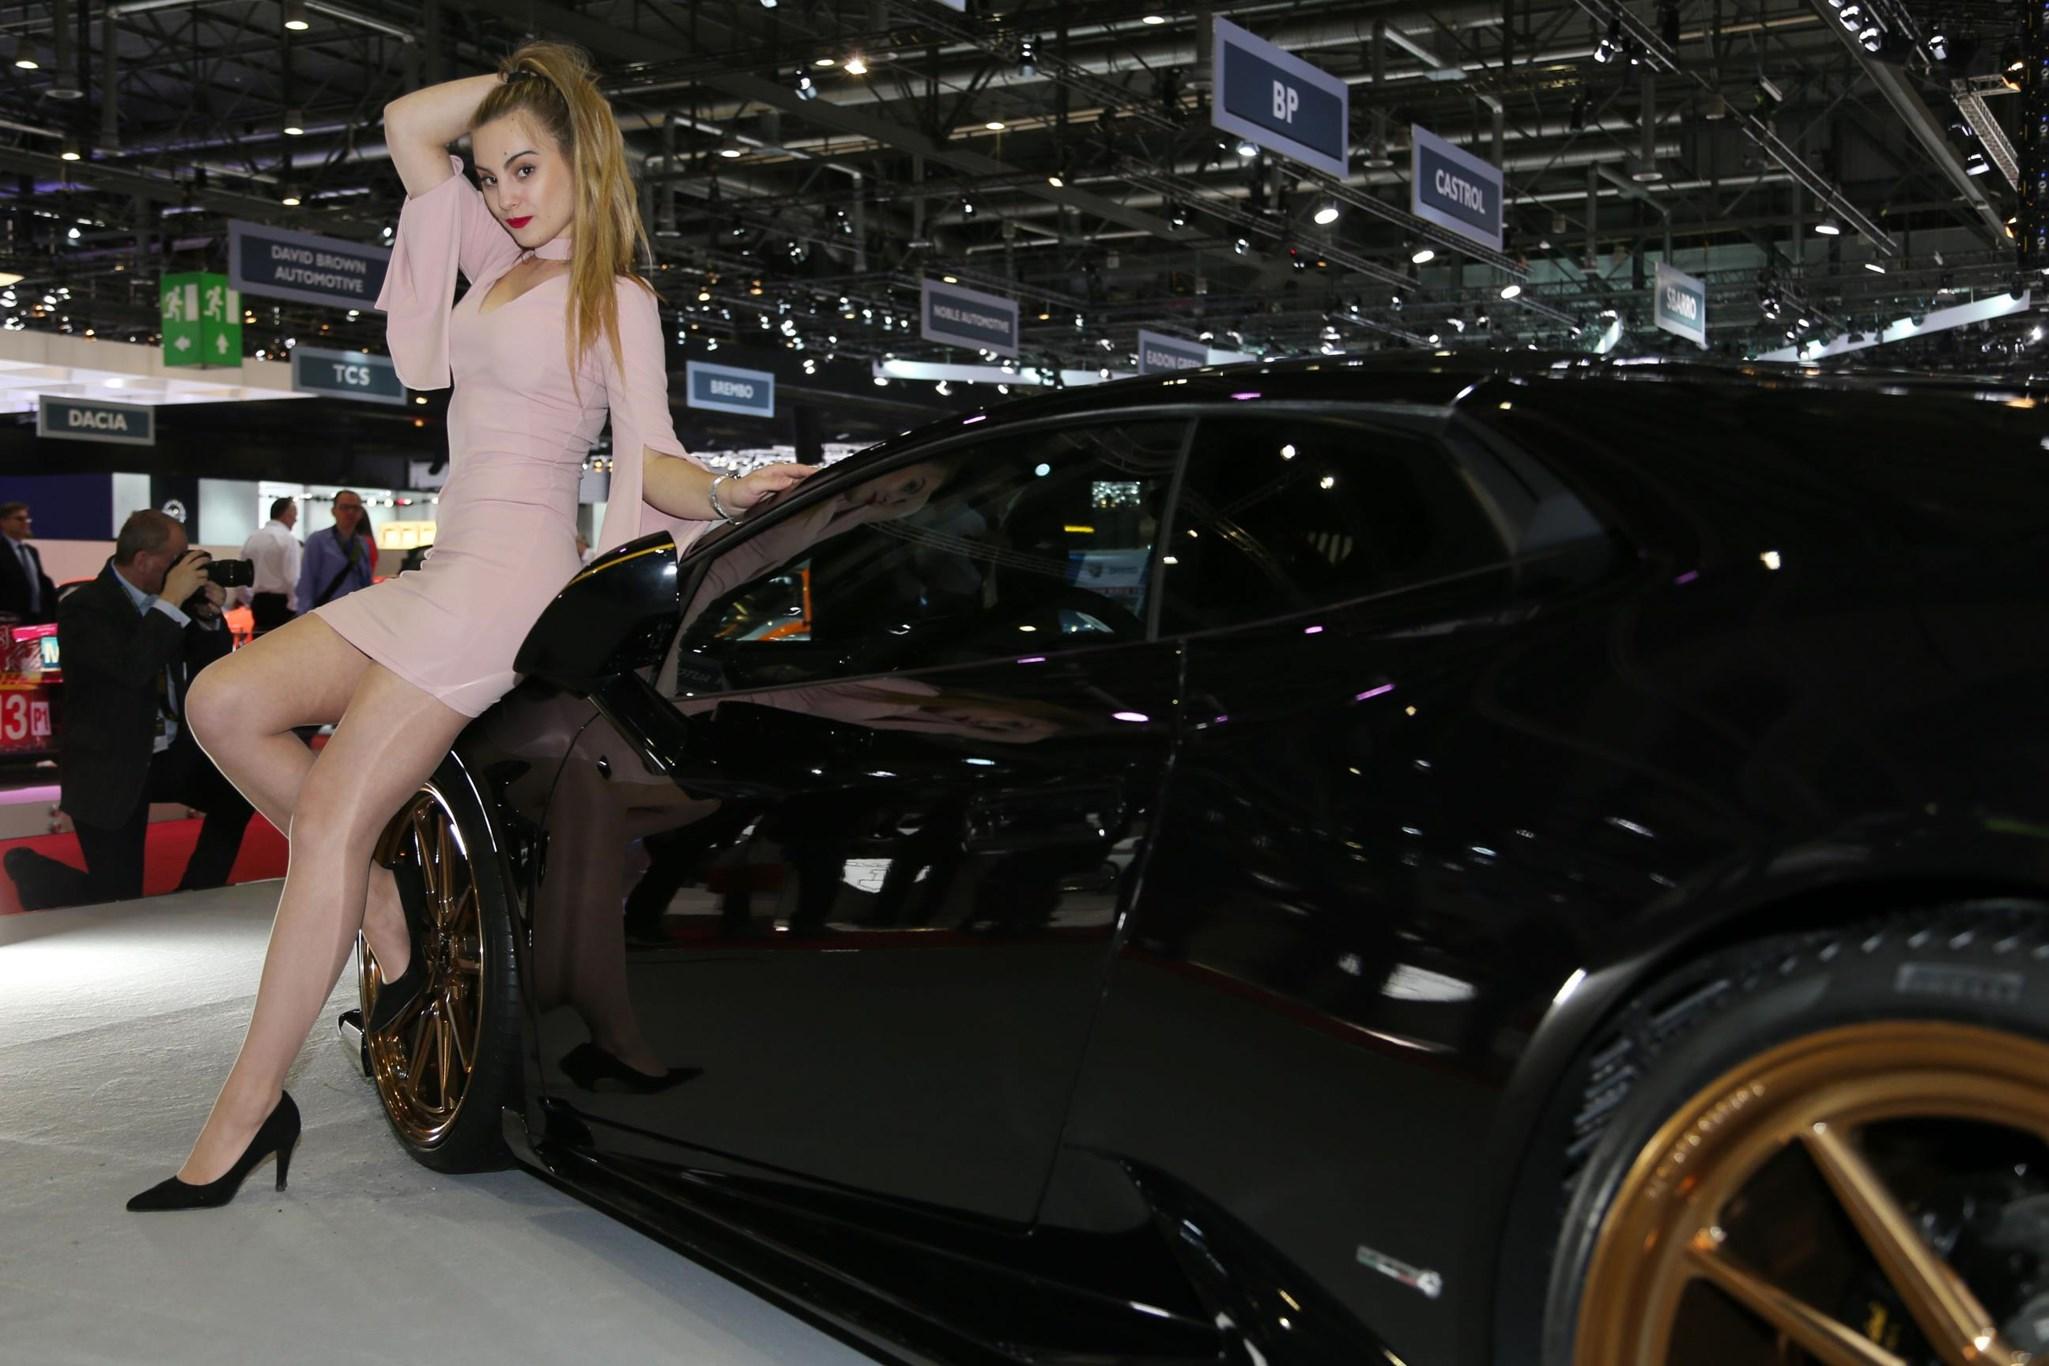 wilson-tits-italian-car-models-girls-young